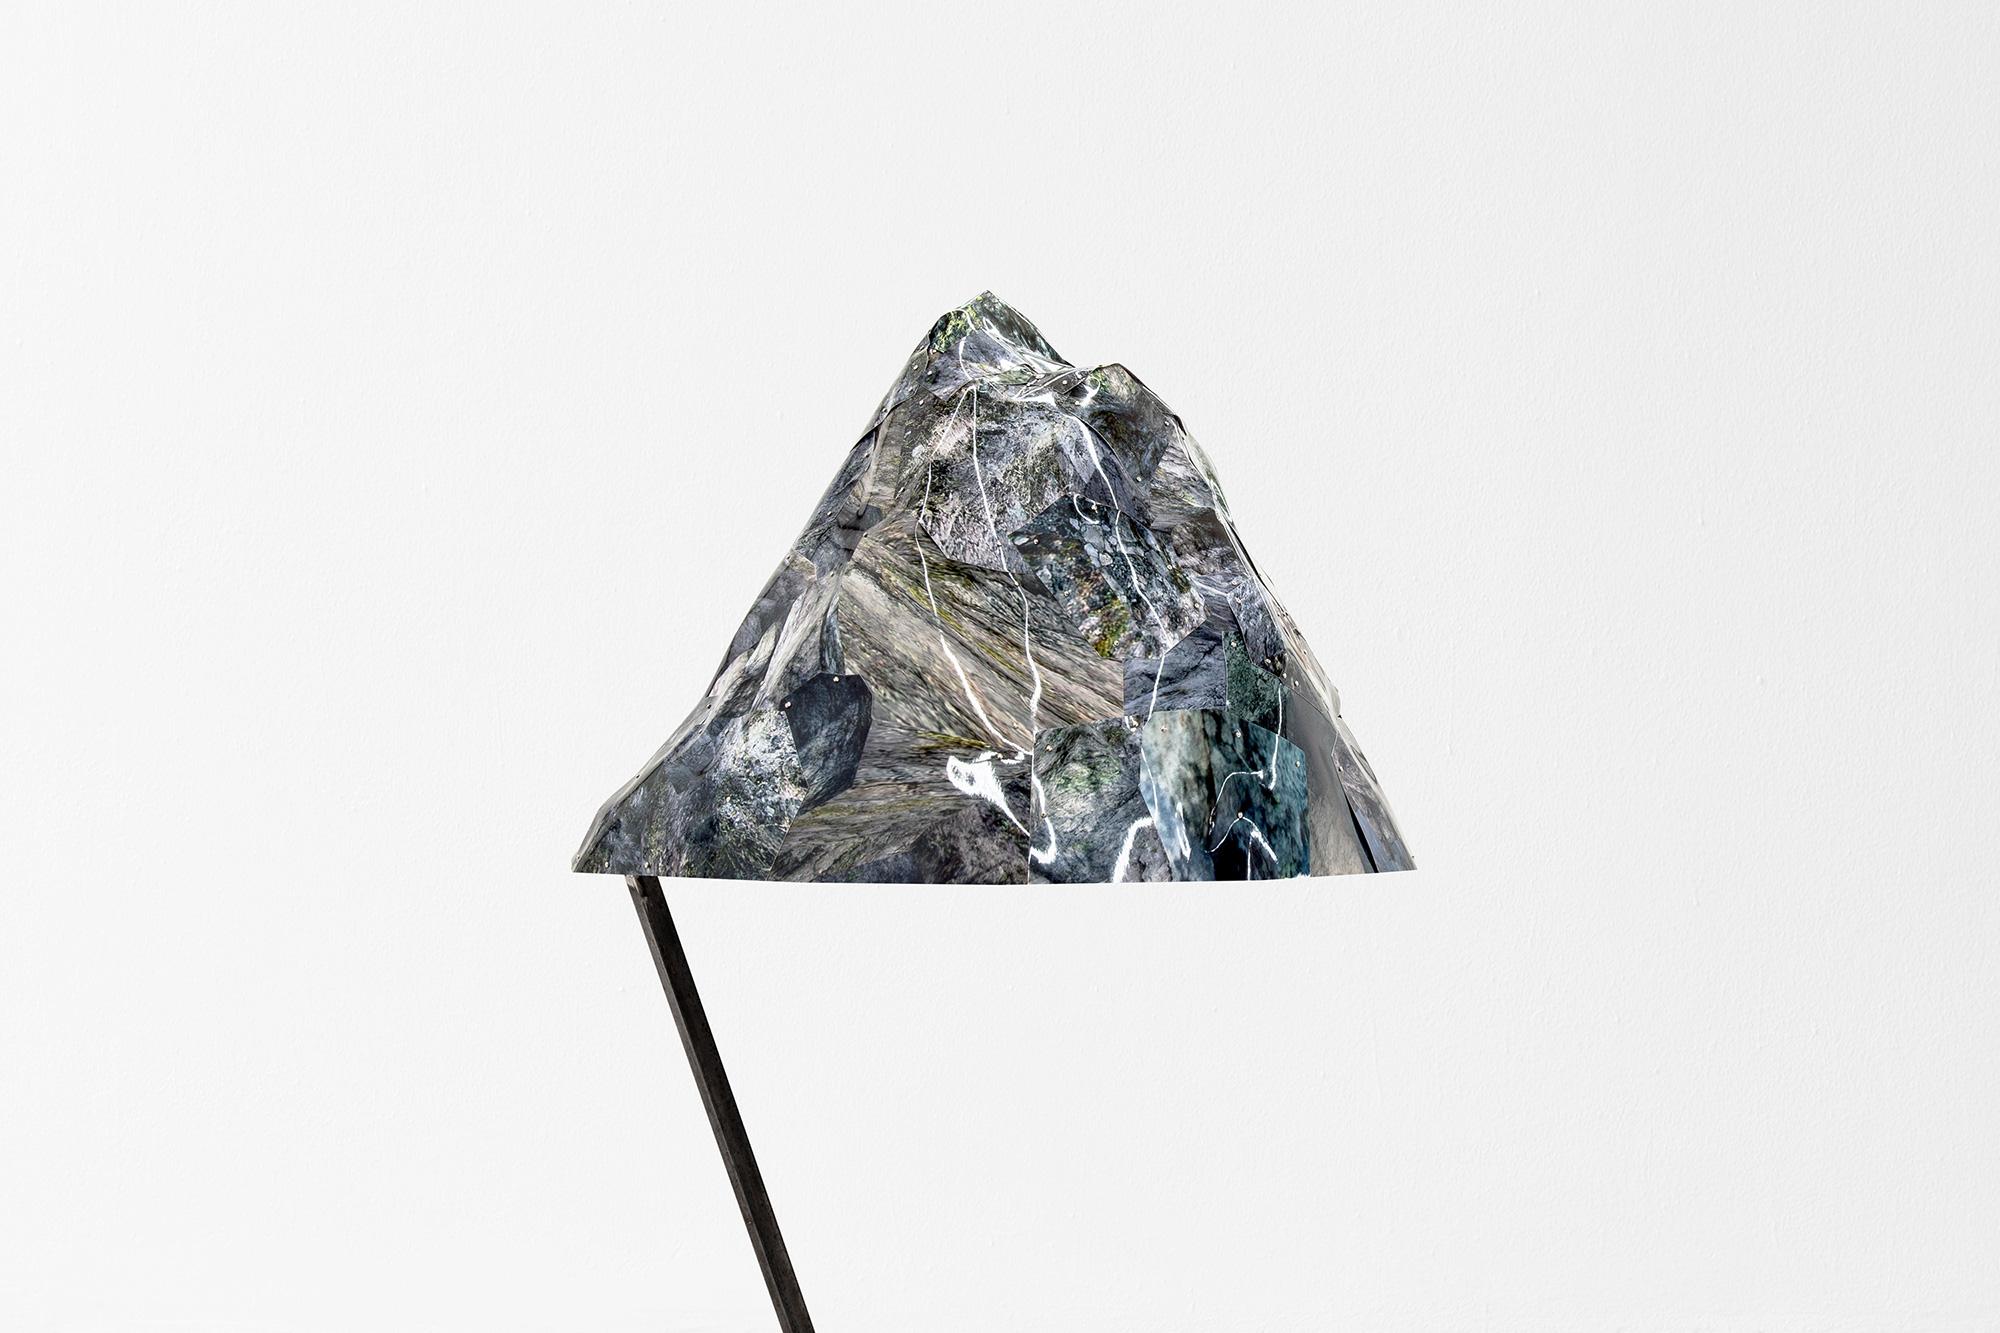 Ewa Doroszenko – Impossible Territory 01, photographic object